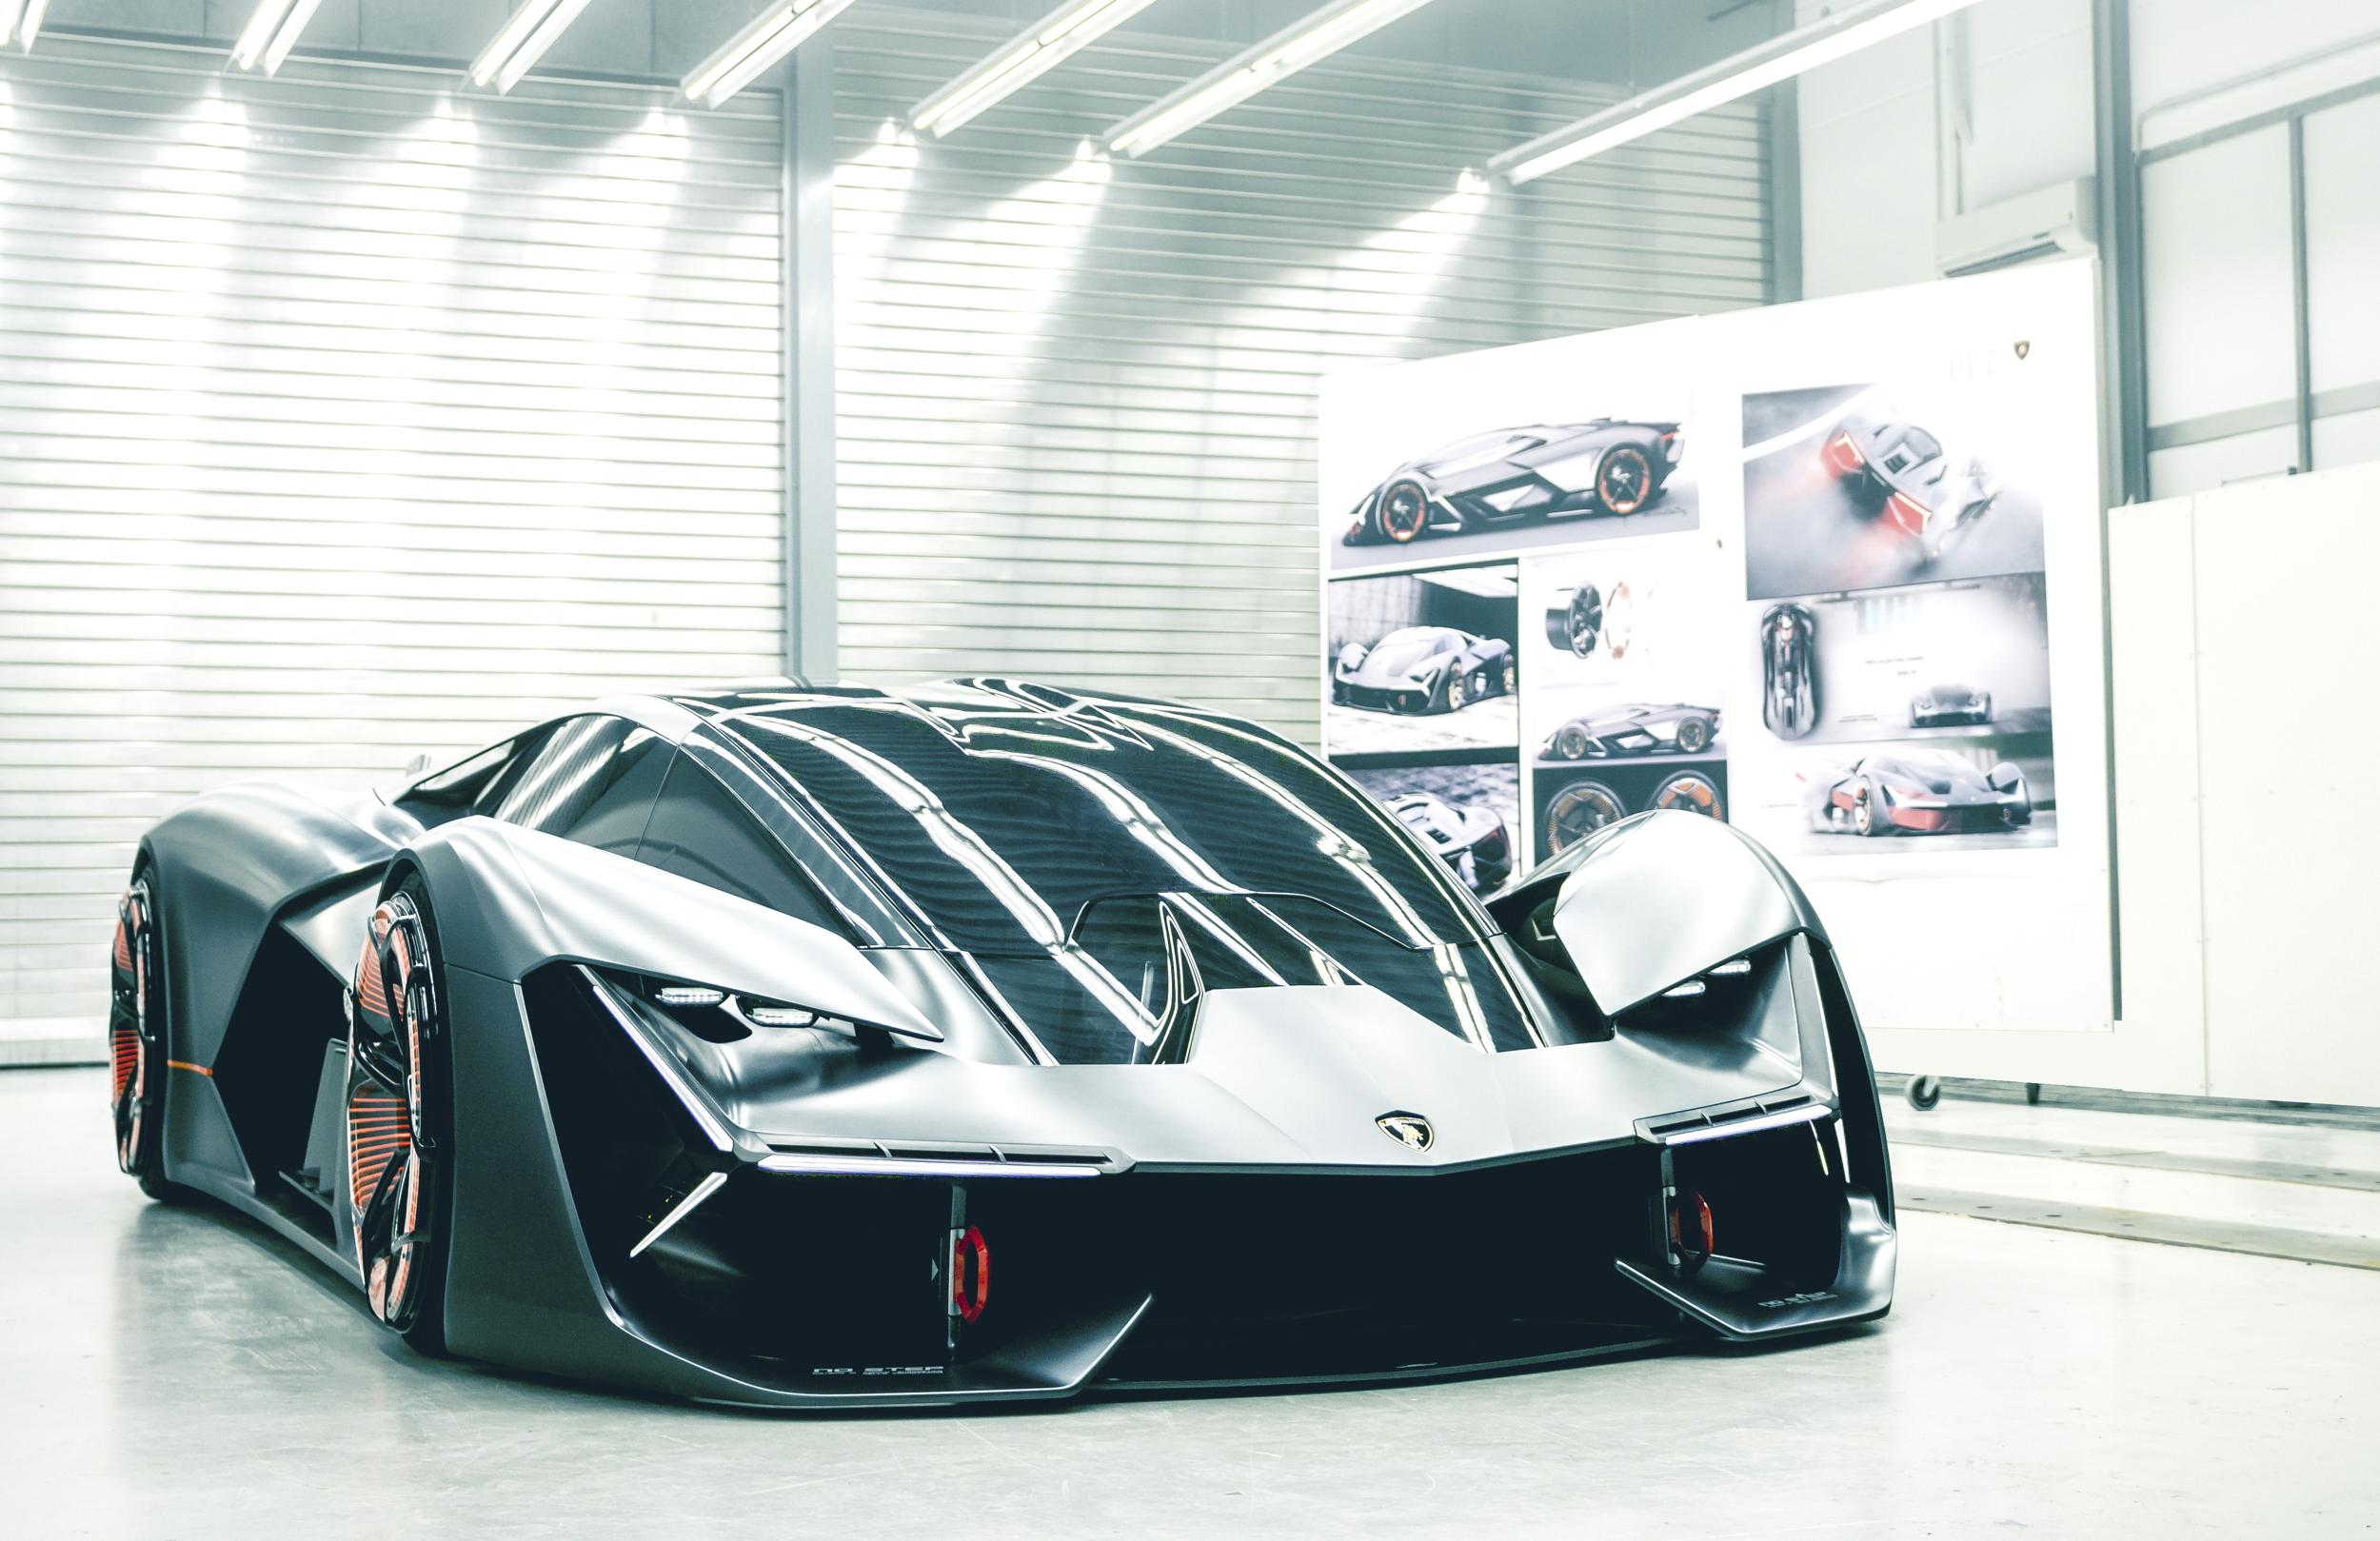 Lamborghini Terzo Millennio front quarter